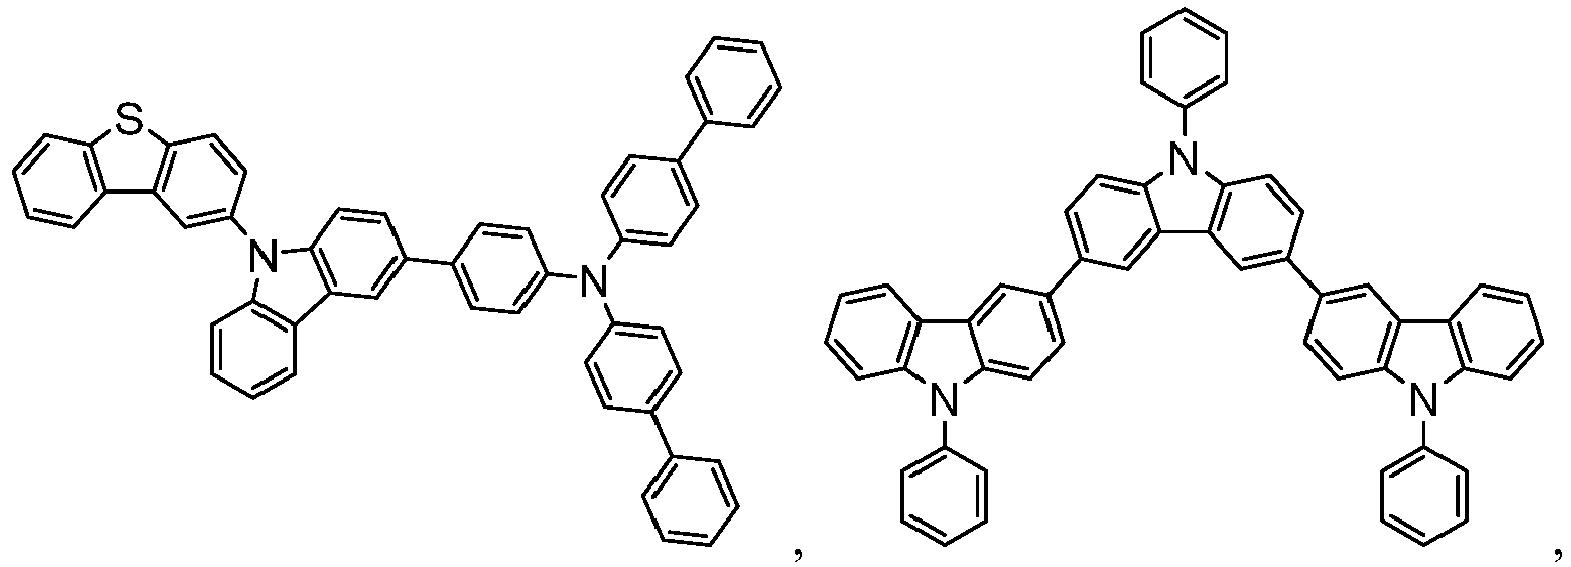 Figure imgb0857